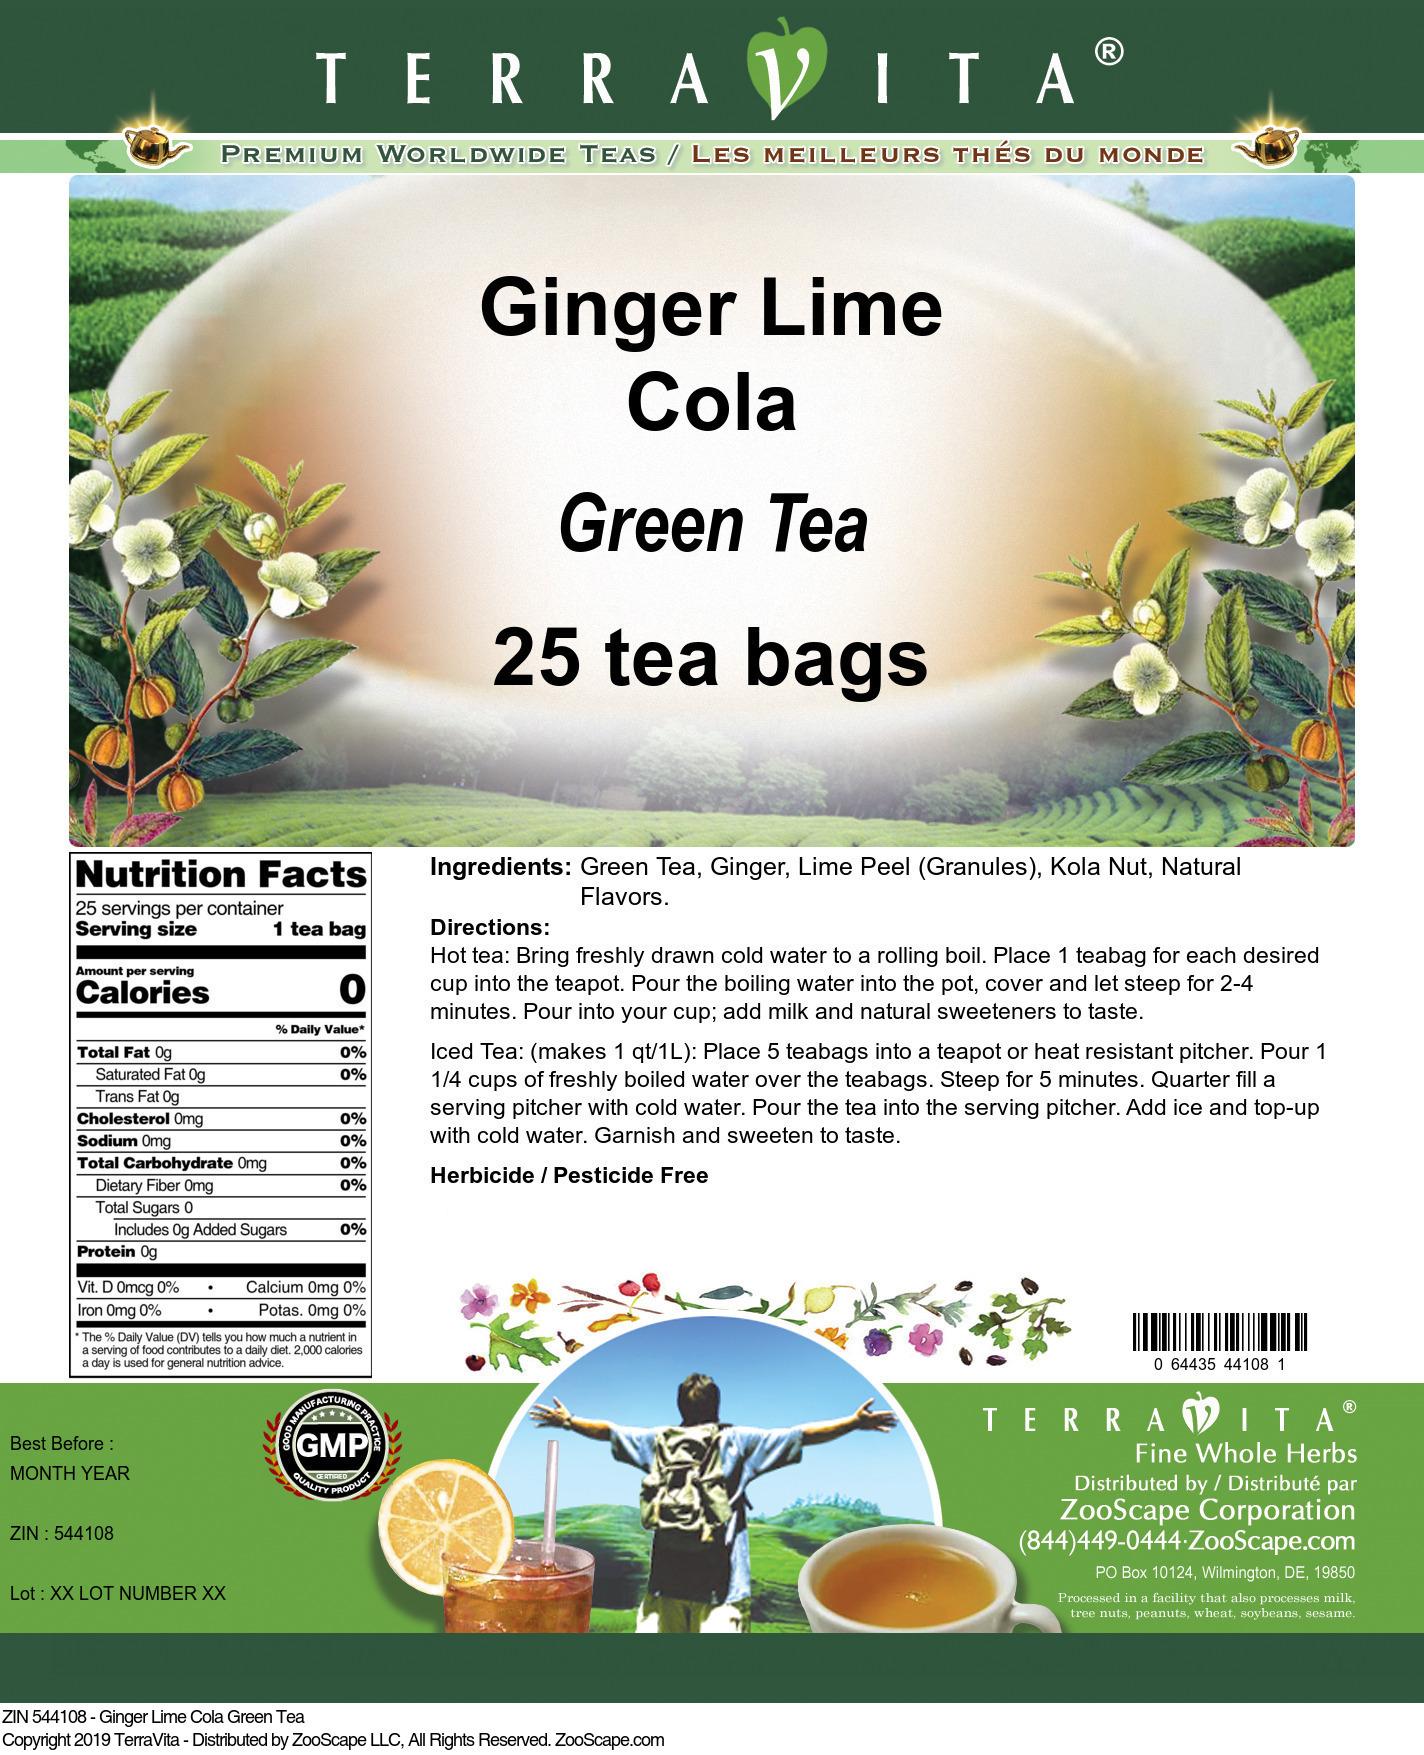 Ginger Lime Cola Green Tea